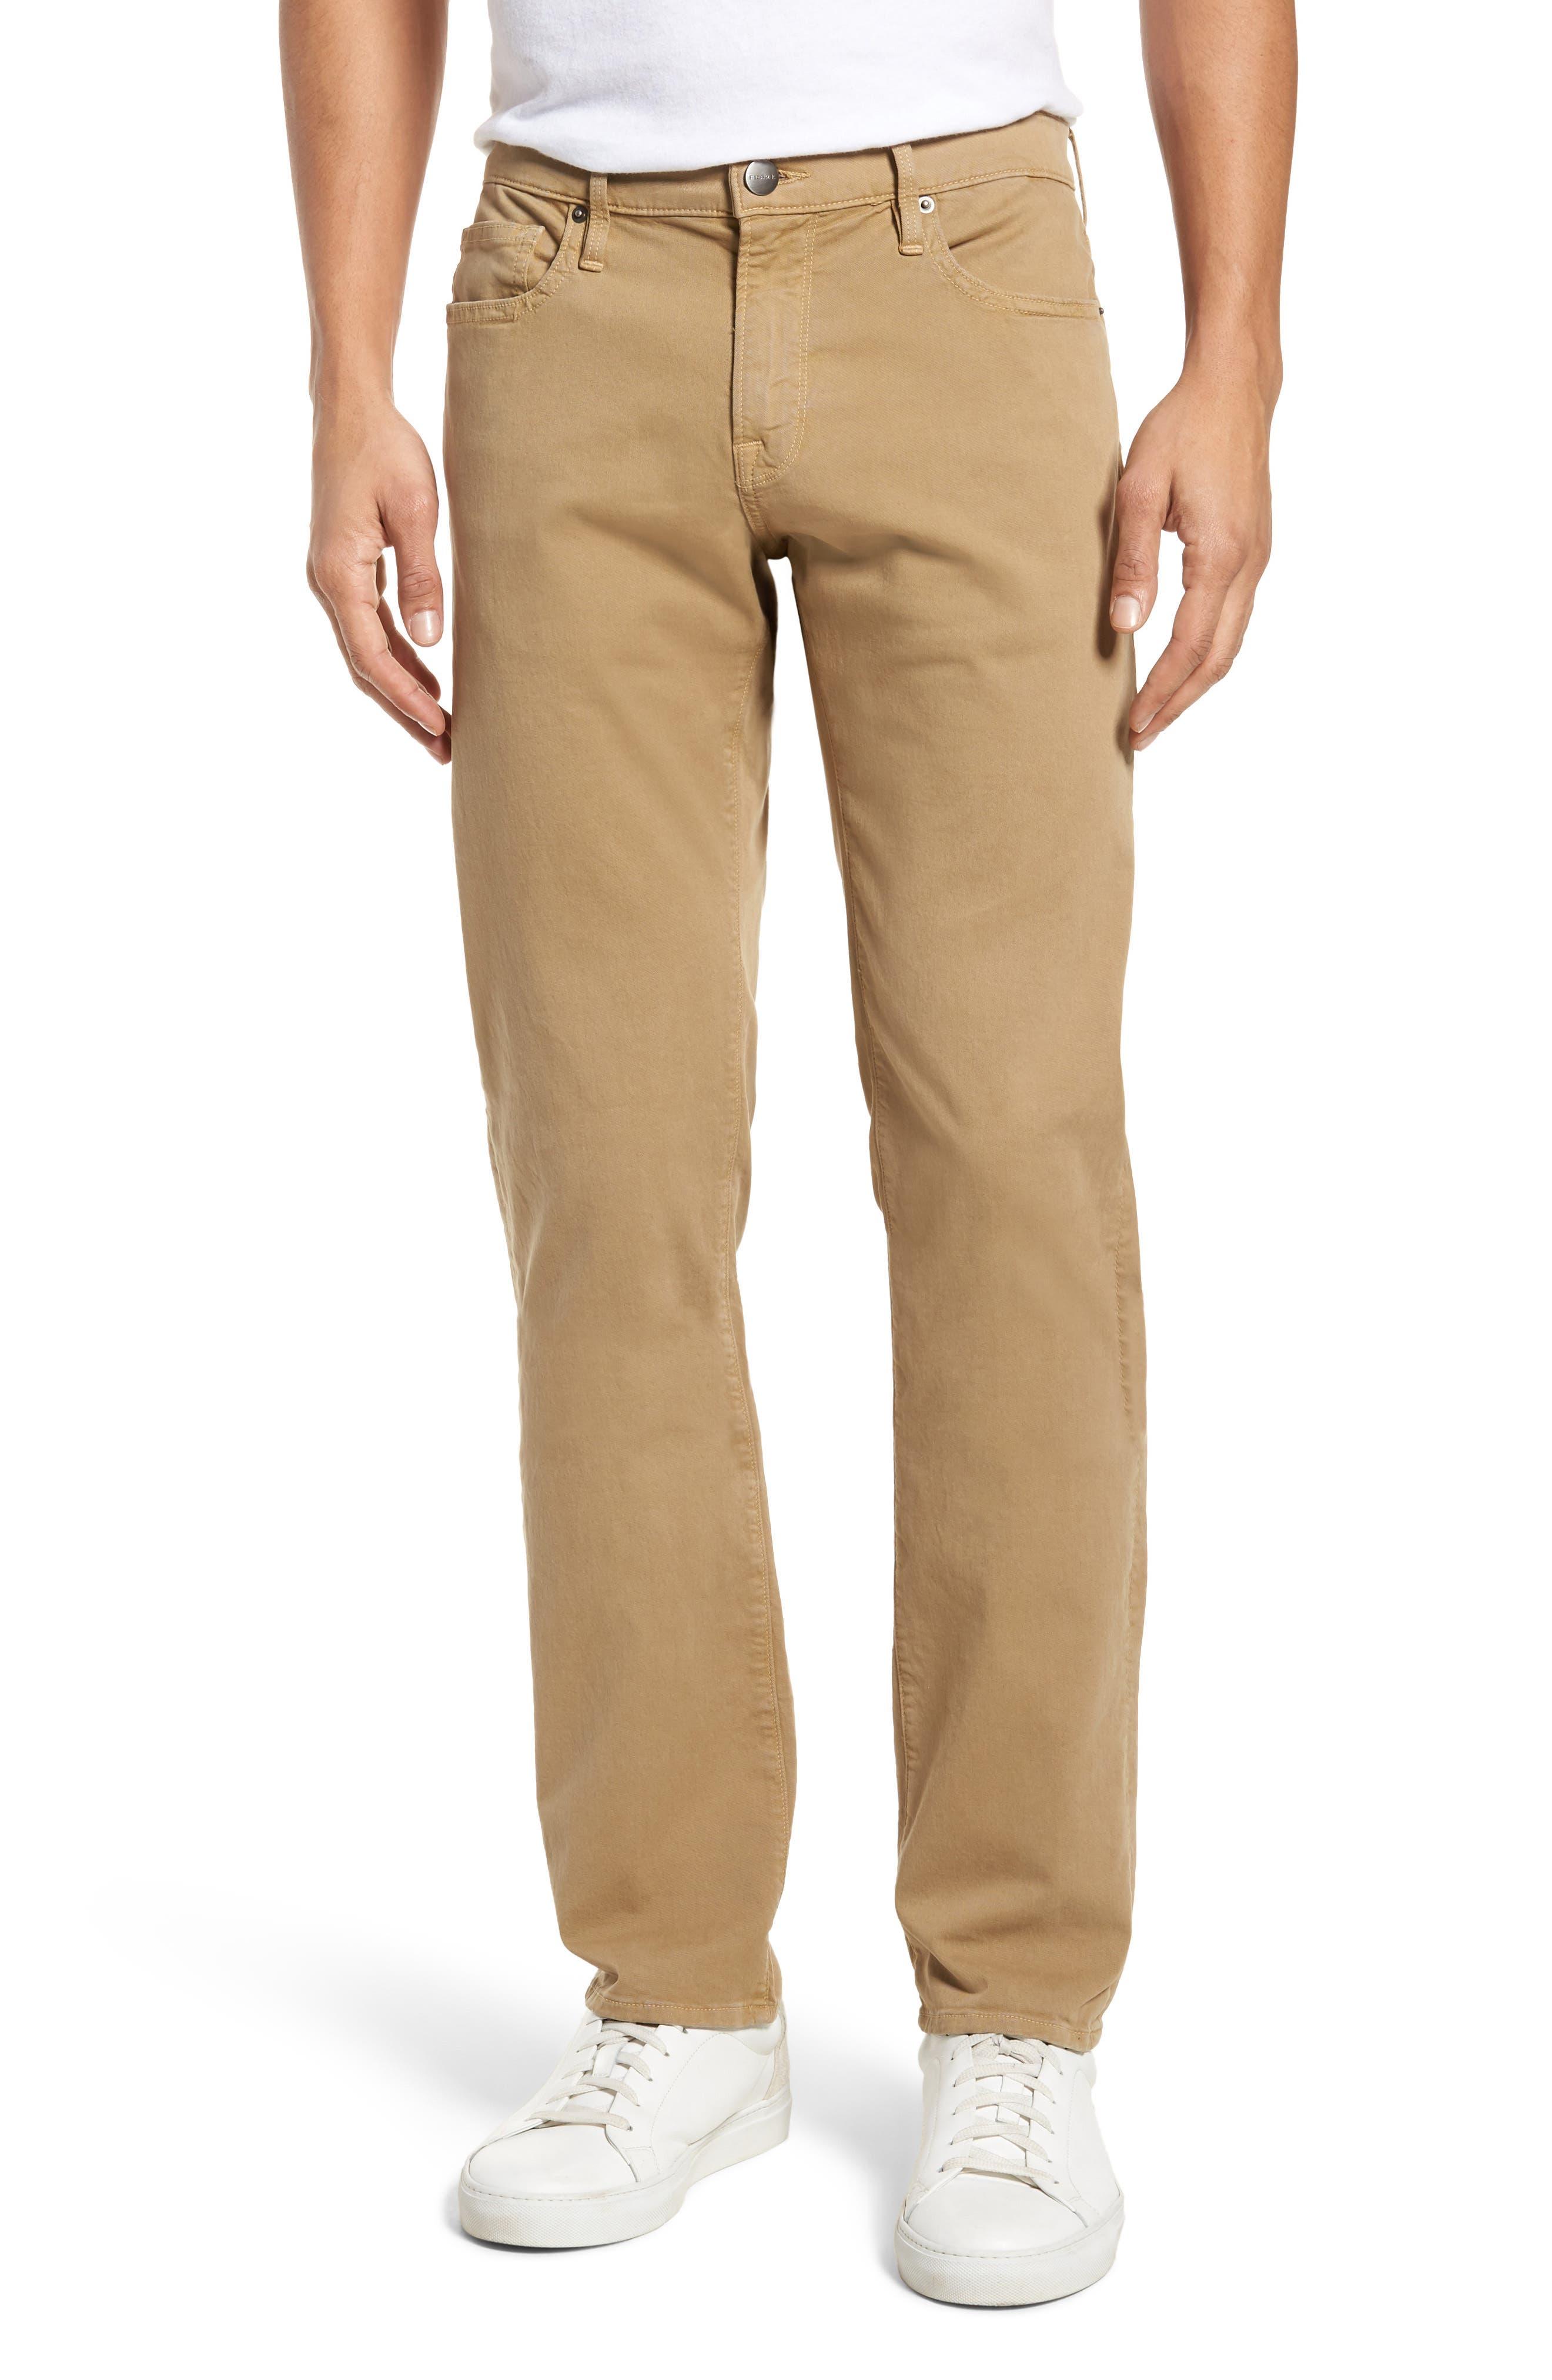 Homme Slim Fit Chino Pants,                             Main thumbnail 1, color,                             Khaki